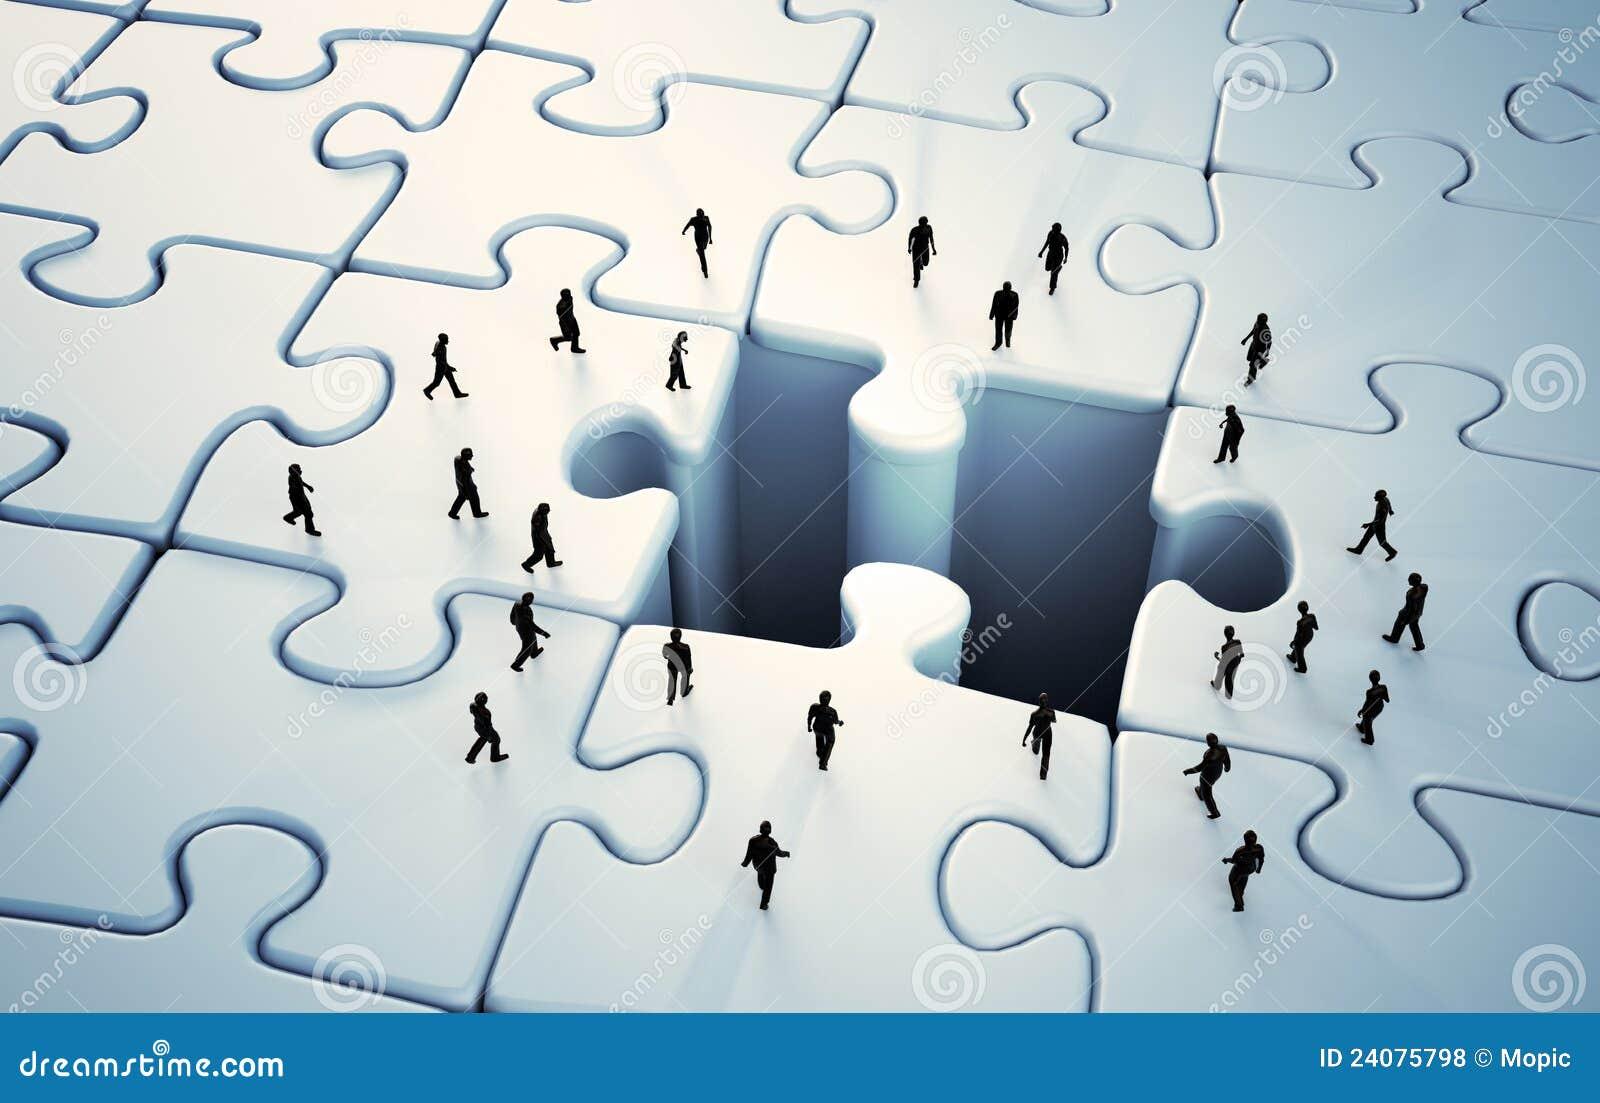 Tiny People Jigsaw Puzzle Stock Illustration Image Of